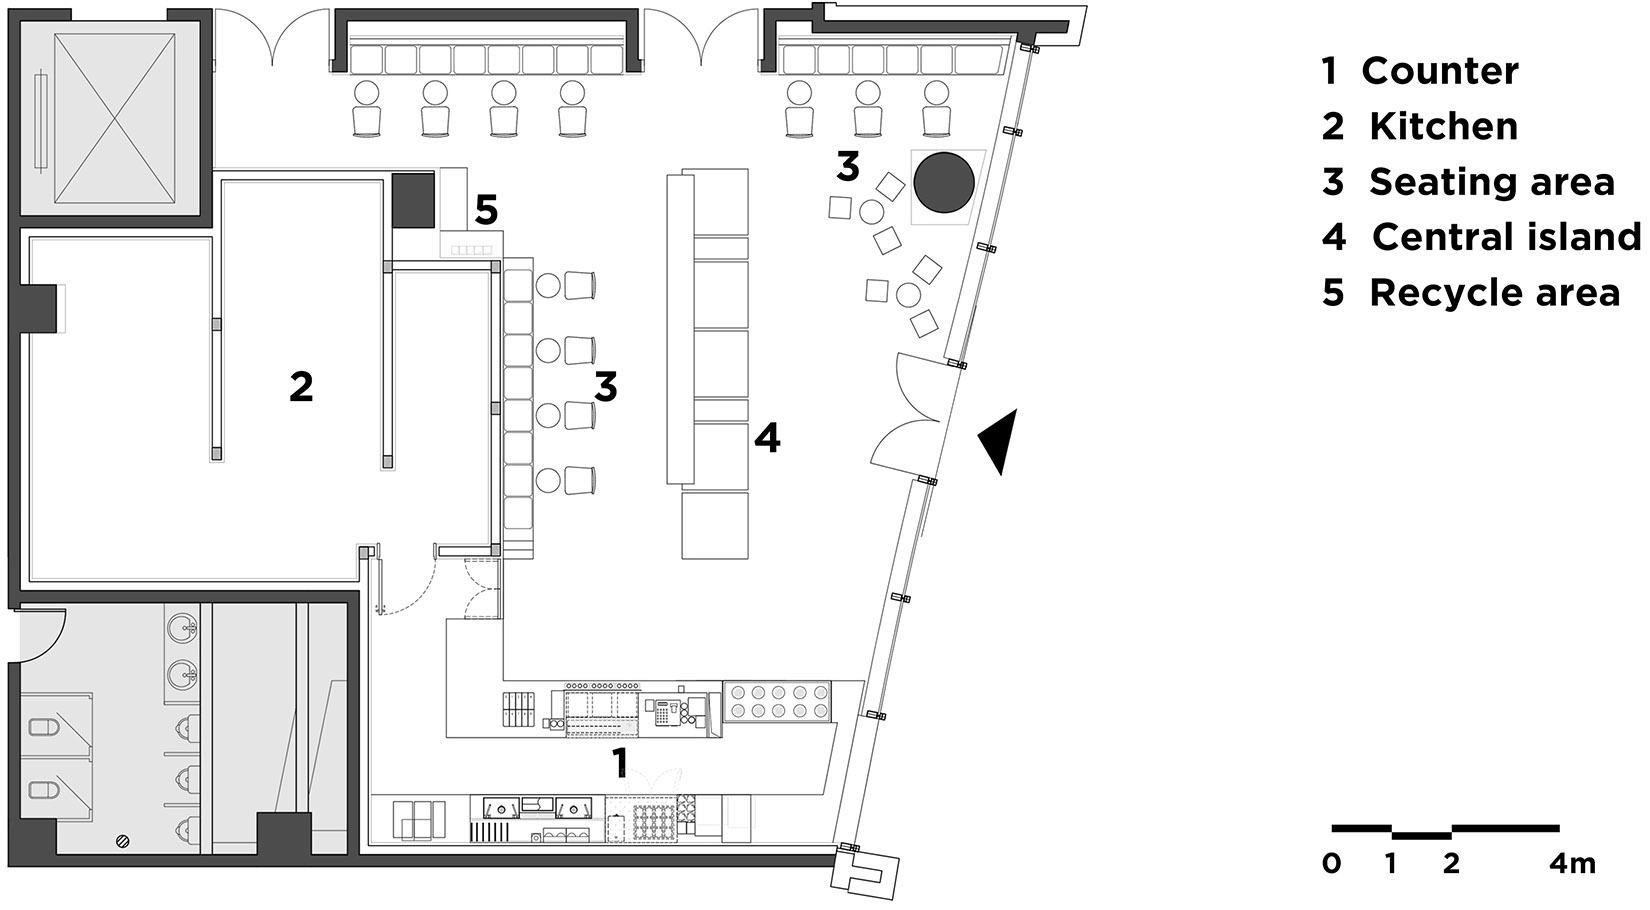 019-heytea-at-one-avenue-shenzhen-china-by-moc-design-office.jpg